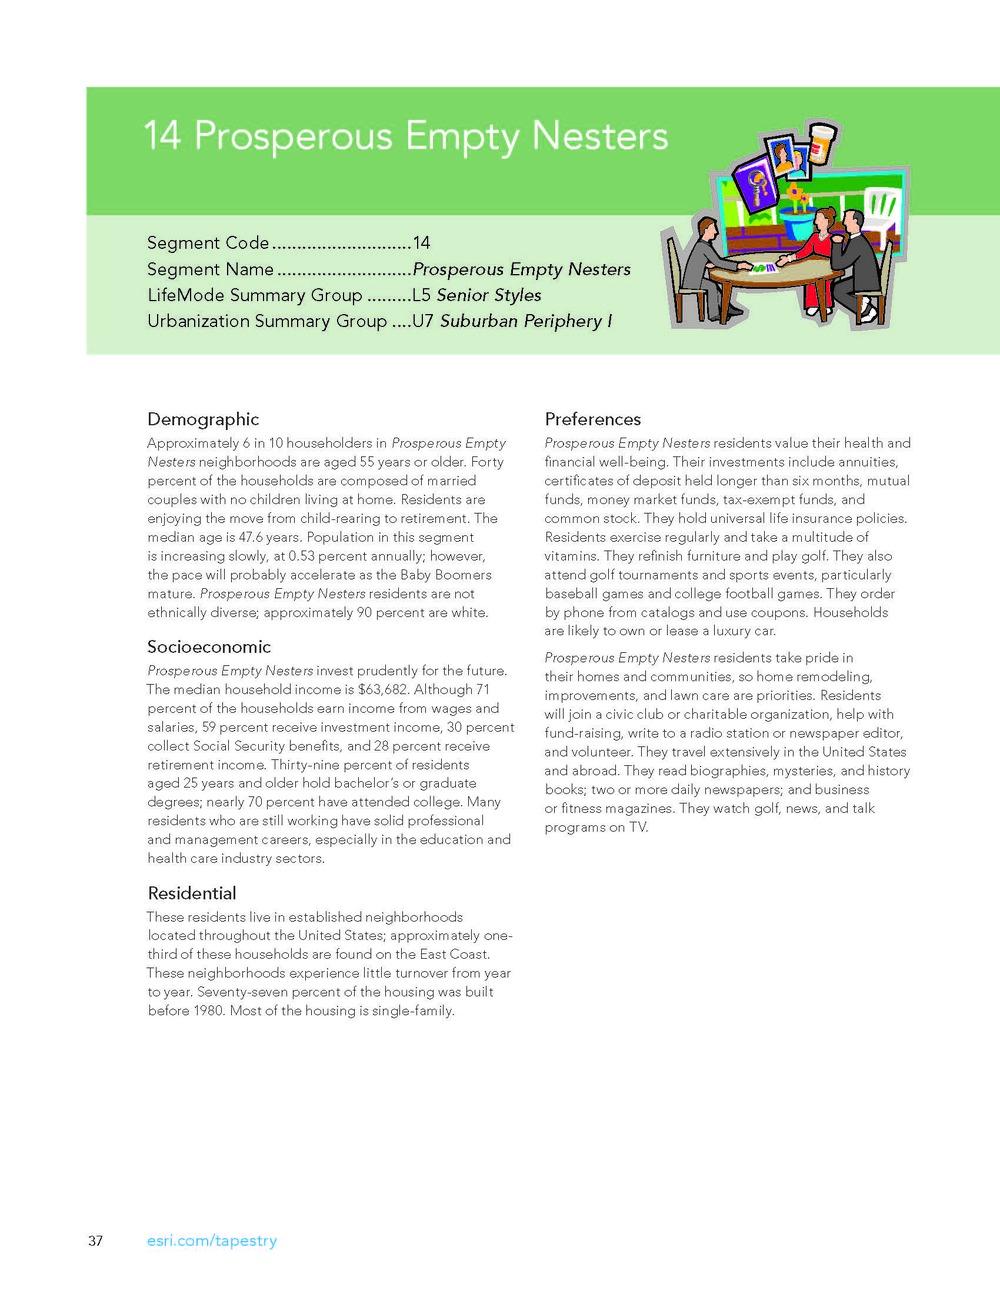 tapestry-segmentation_Page_40.jpg